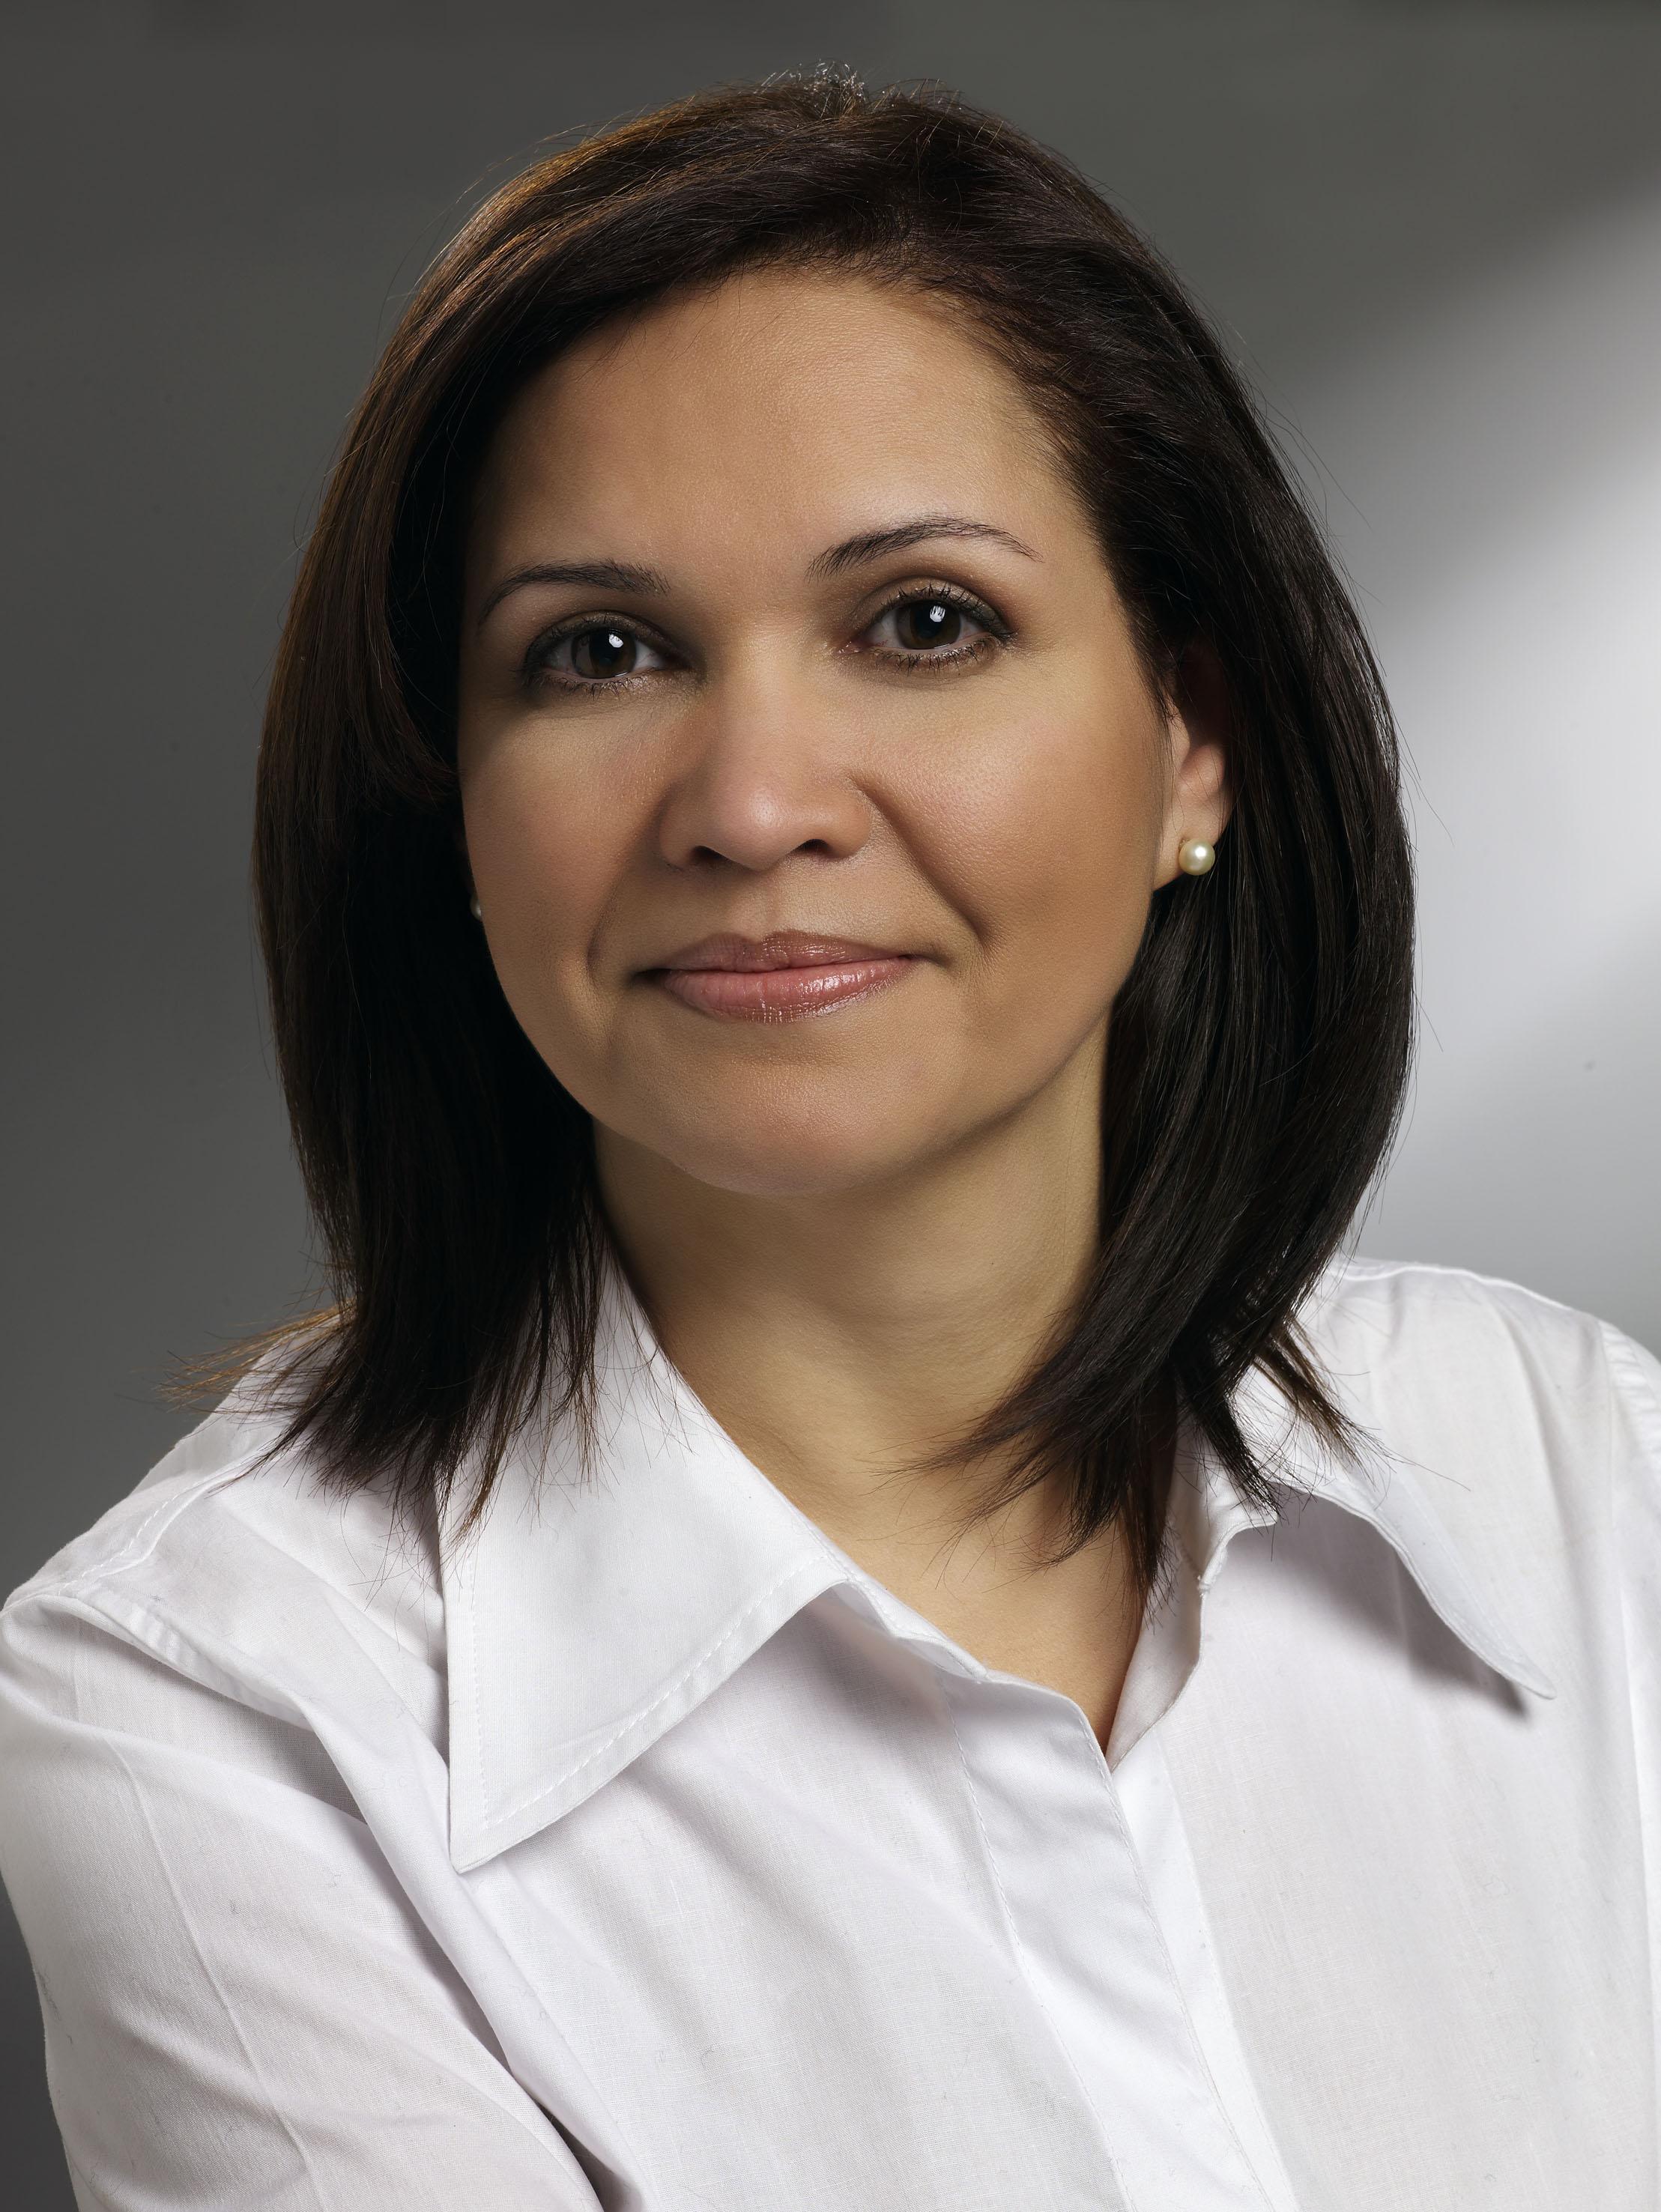 Maria Almeida Garcia